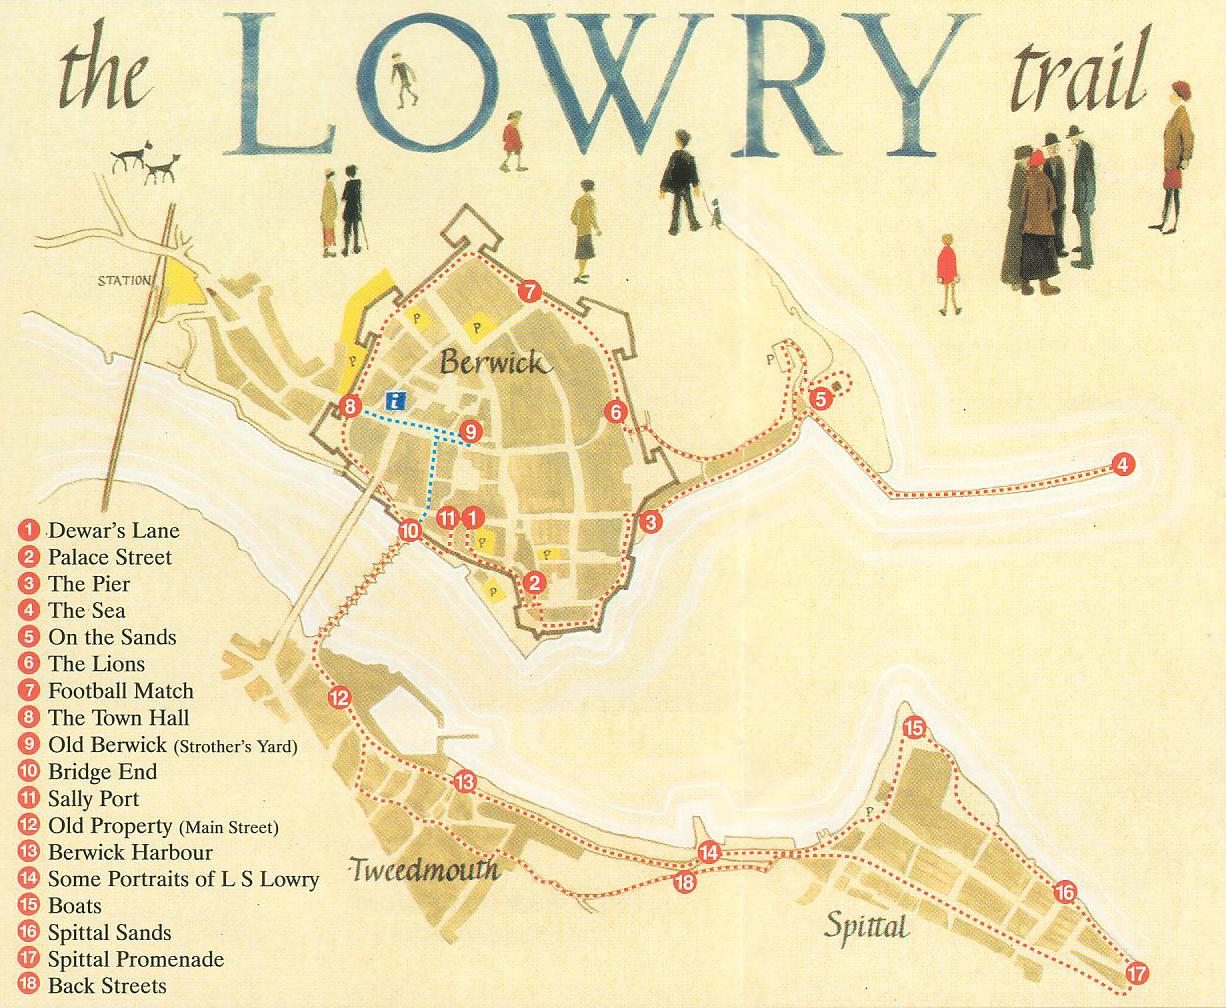 Lowry Trail Map